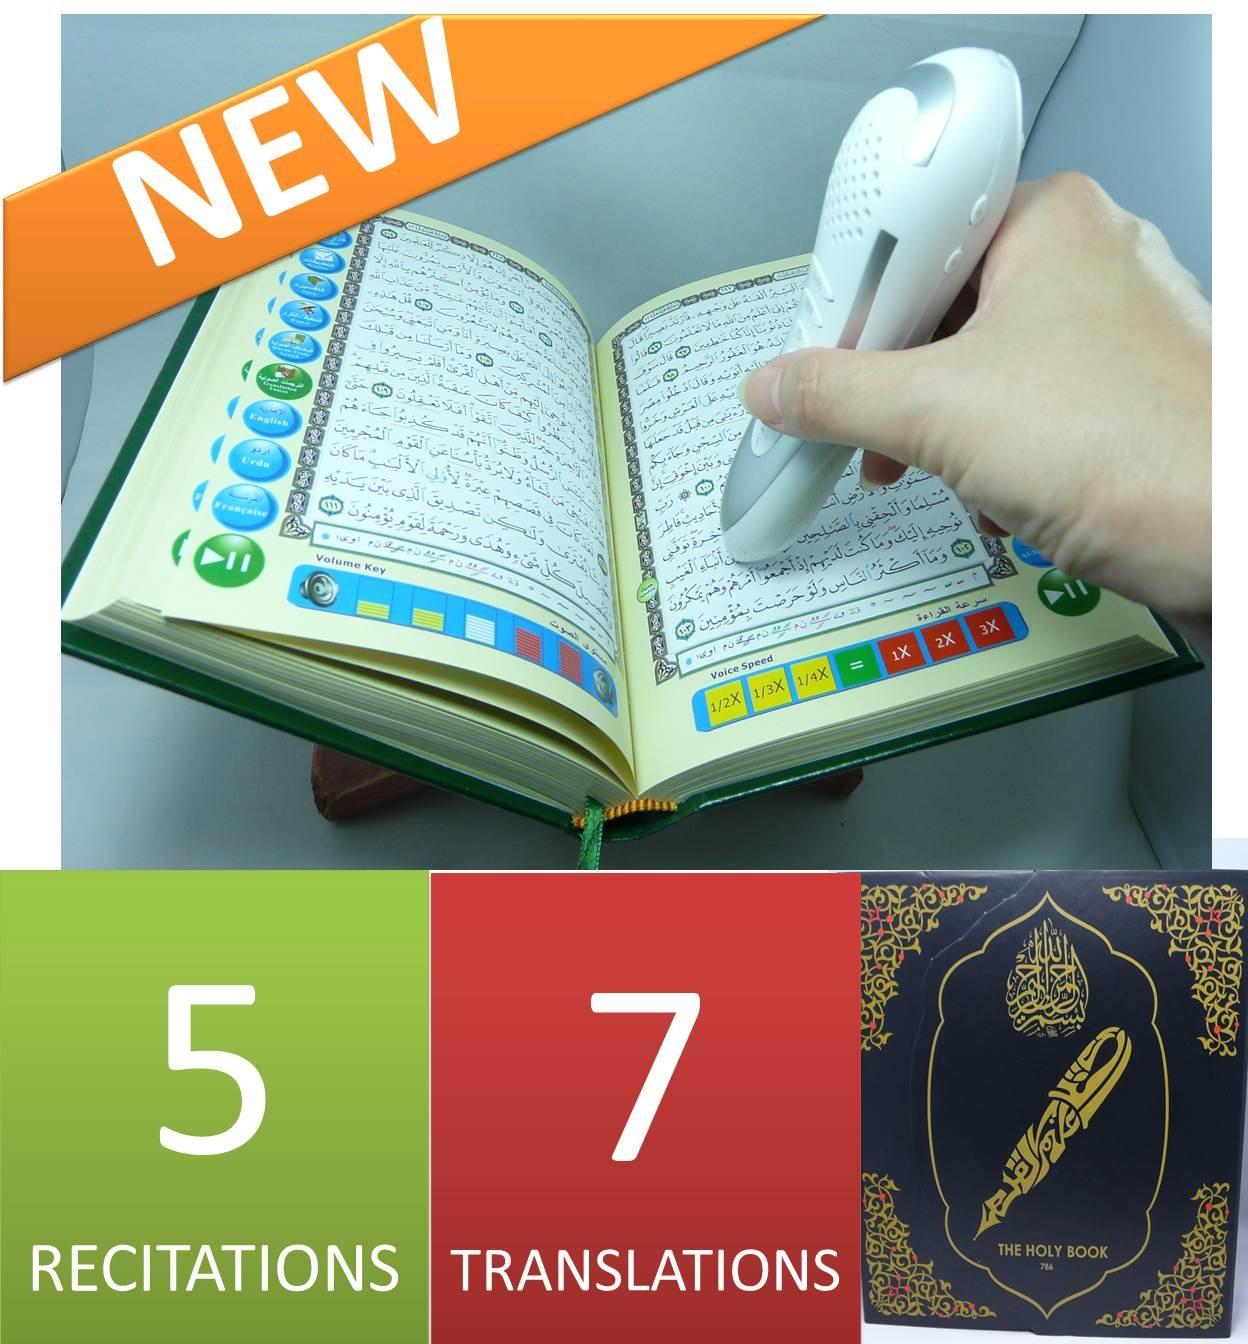 Islamic Electronic Digital Holy Quran Koran Qu'ran Reader